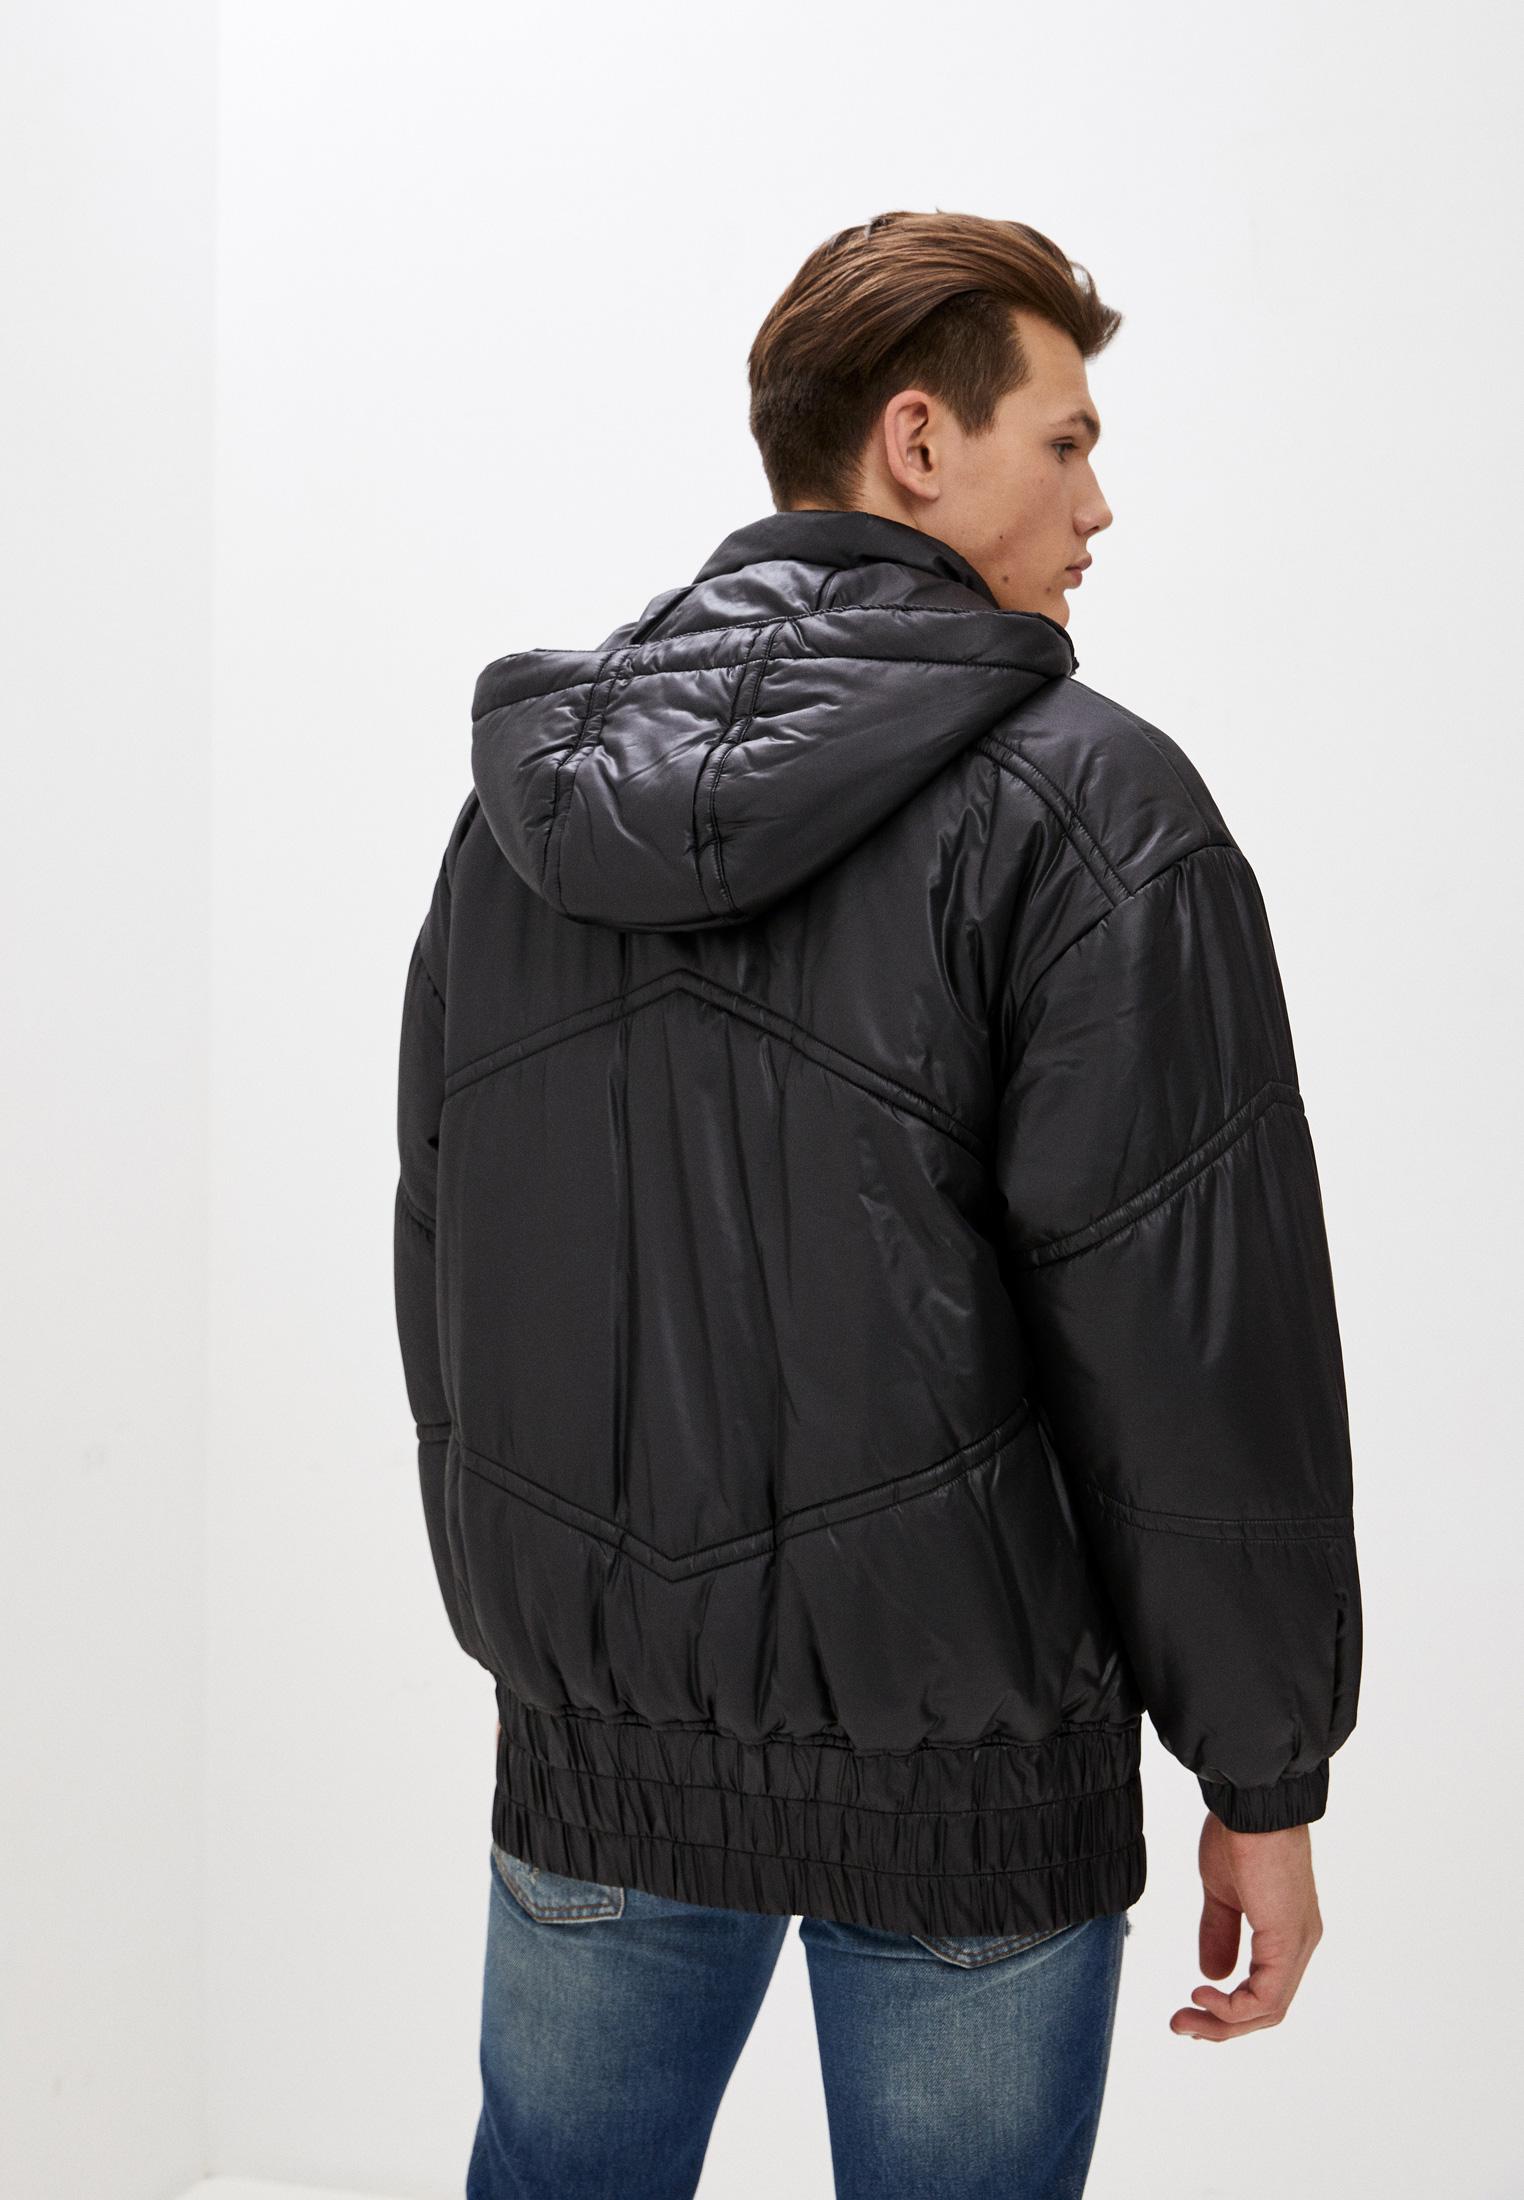 Куртка Just Cavalli (Джаст Кавалли) s01am0330n39530: изображение 4